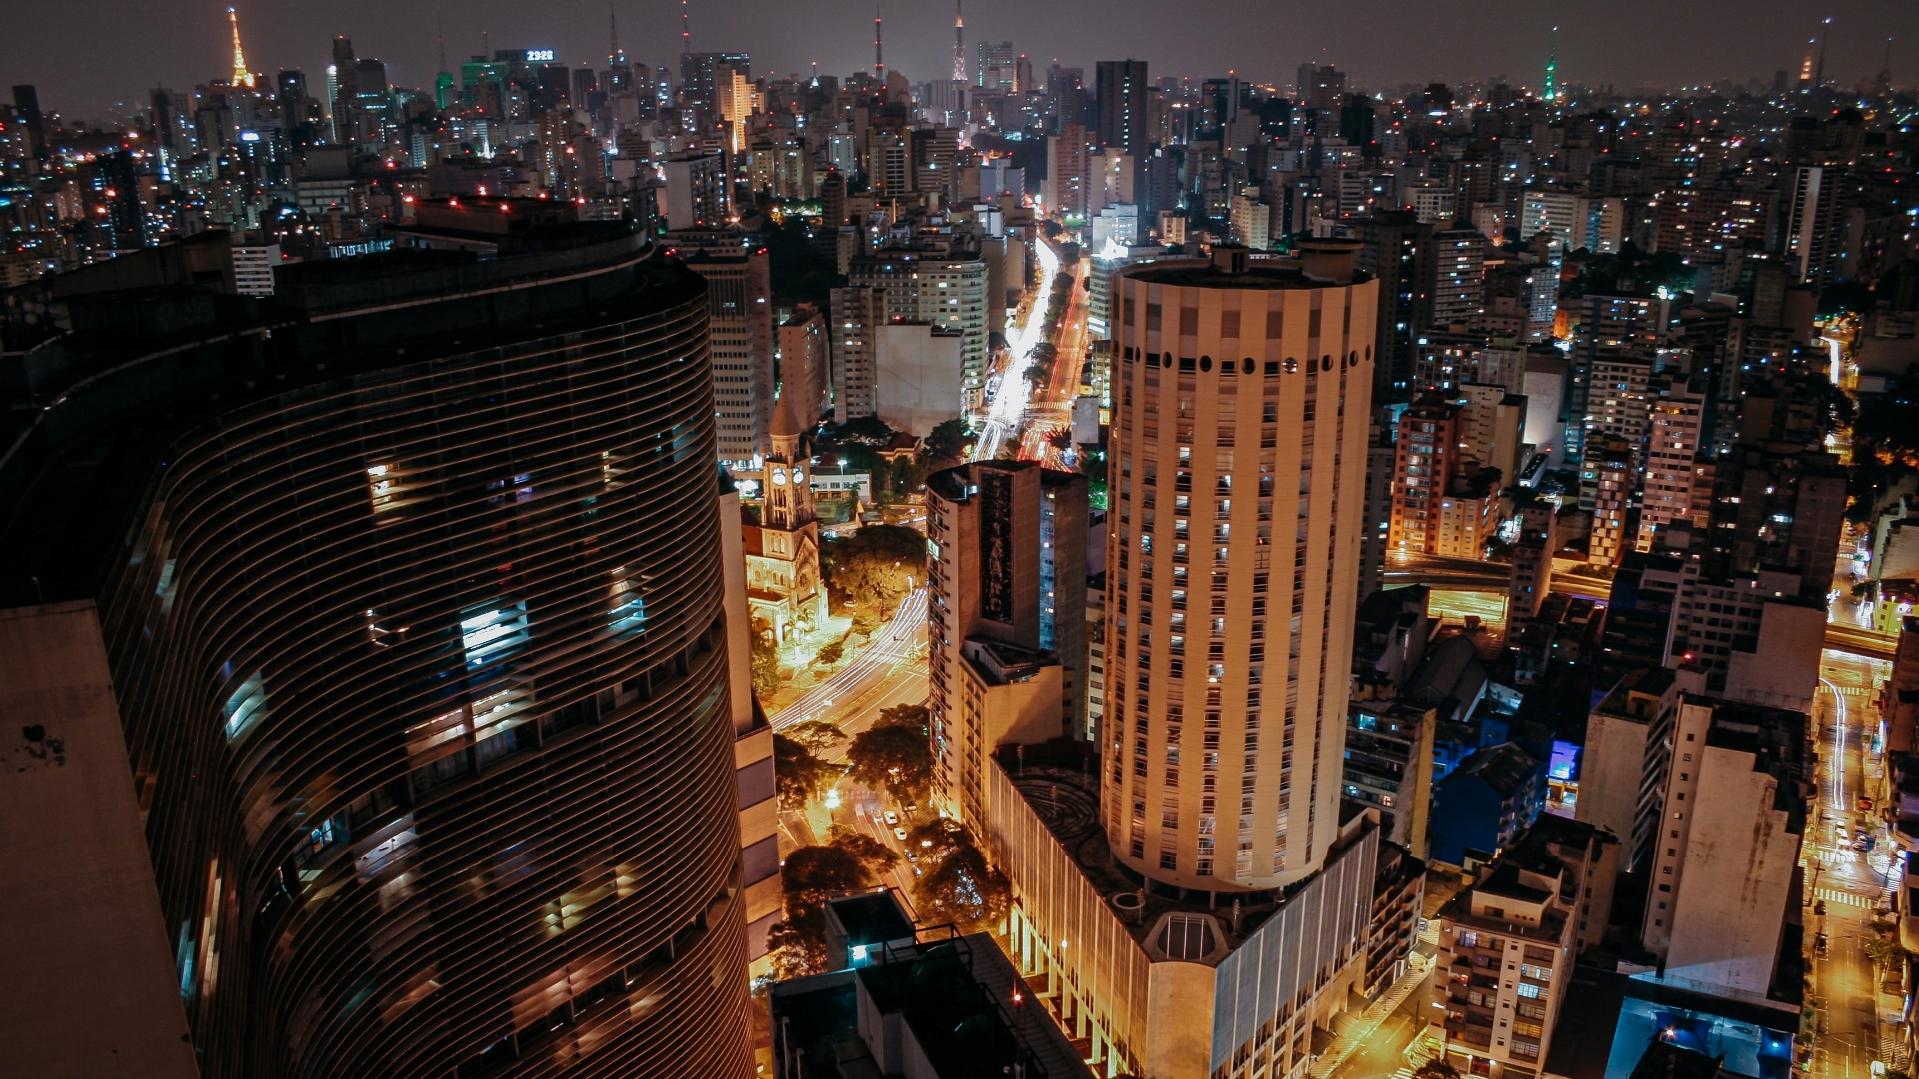 Aos 467 anos, São Paulo preserva diversidade como característica - propmark